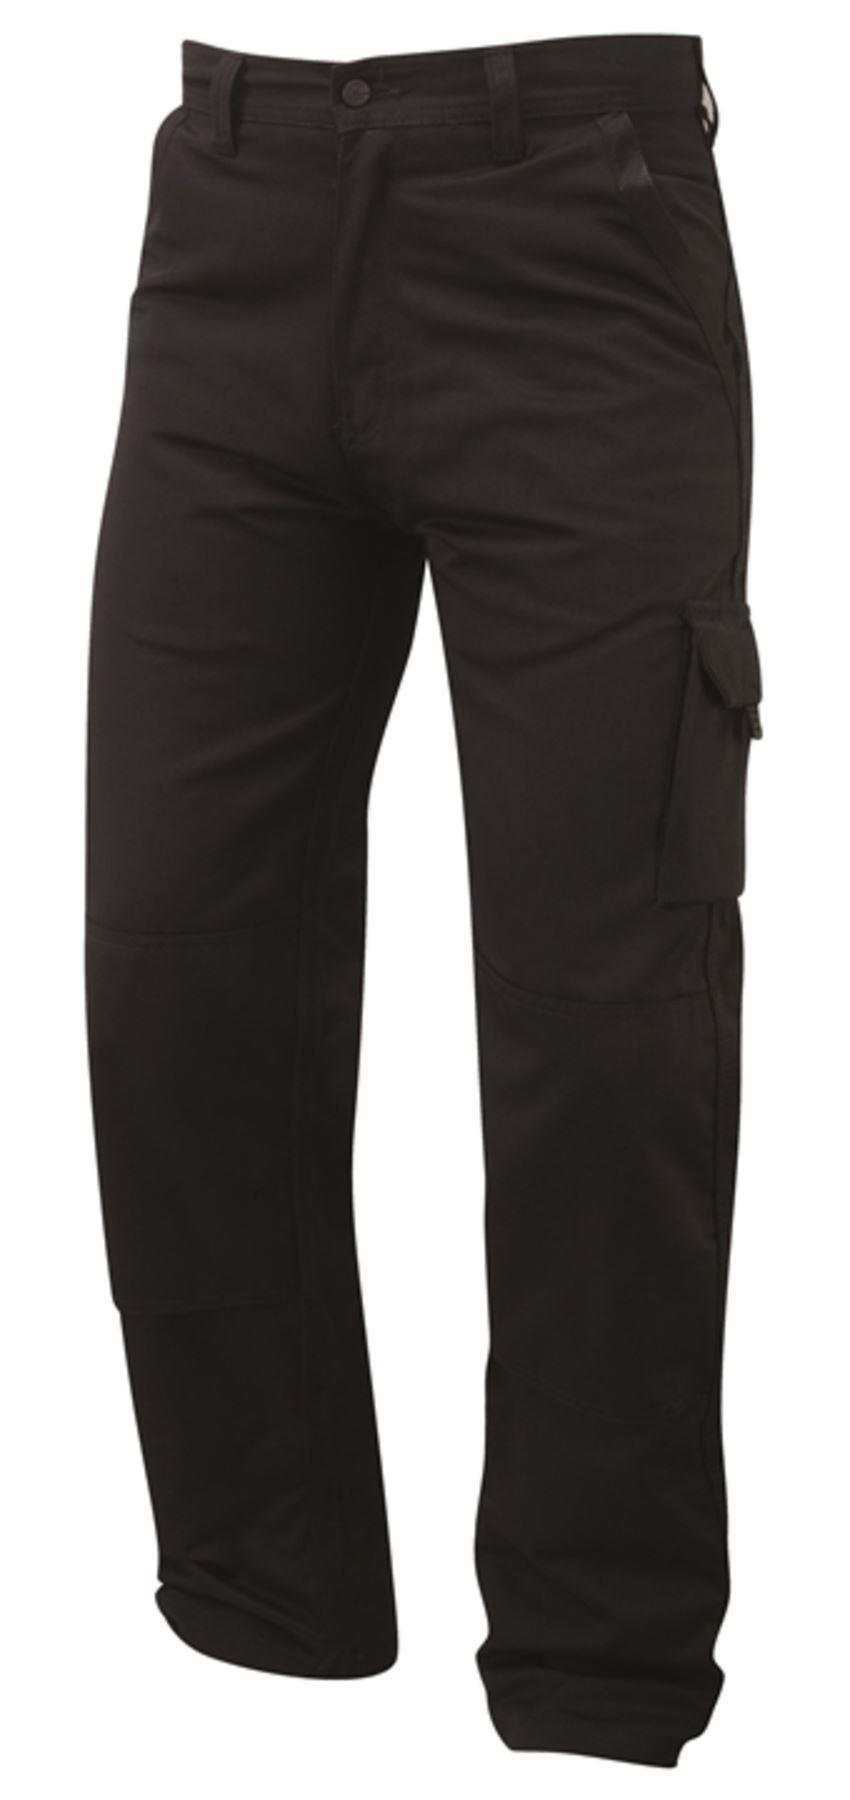 Orn Heron Kneepad Combat Trousers - Black|44W32L